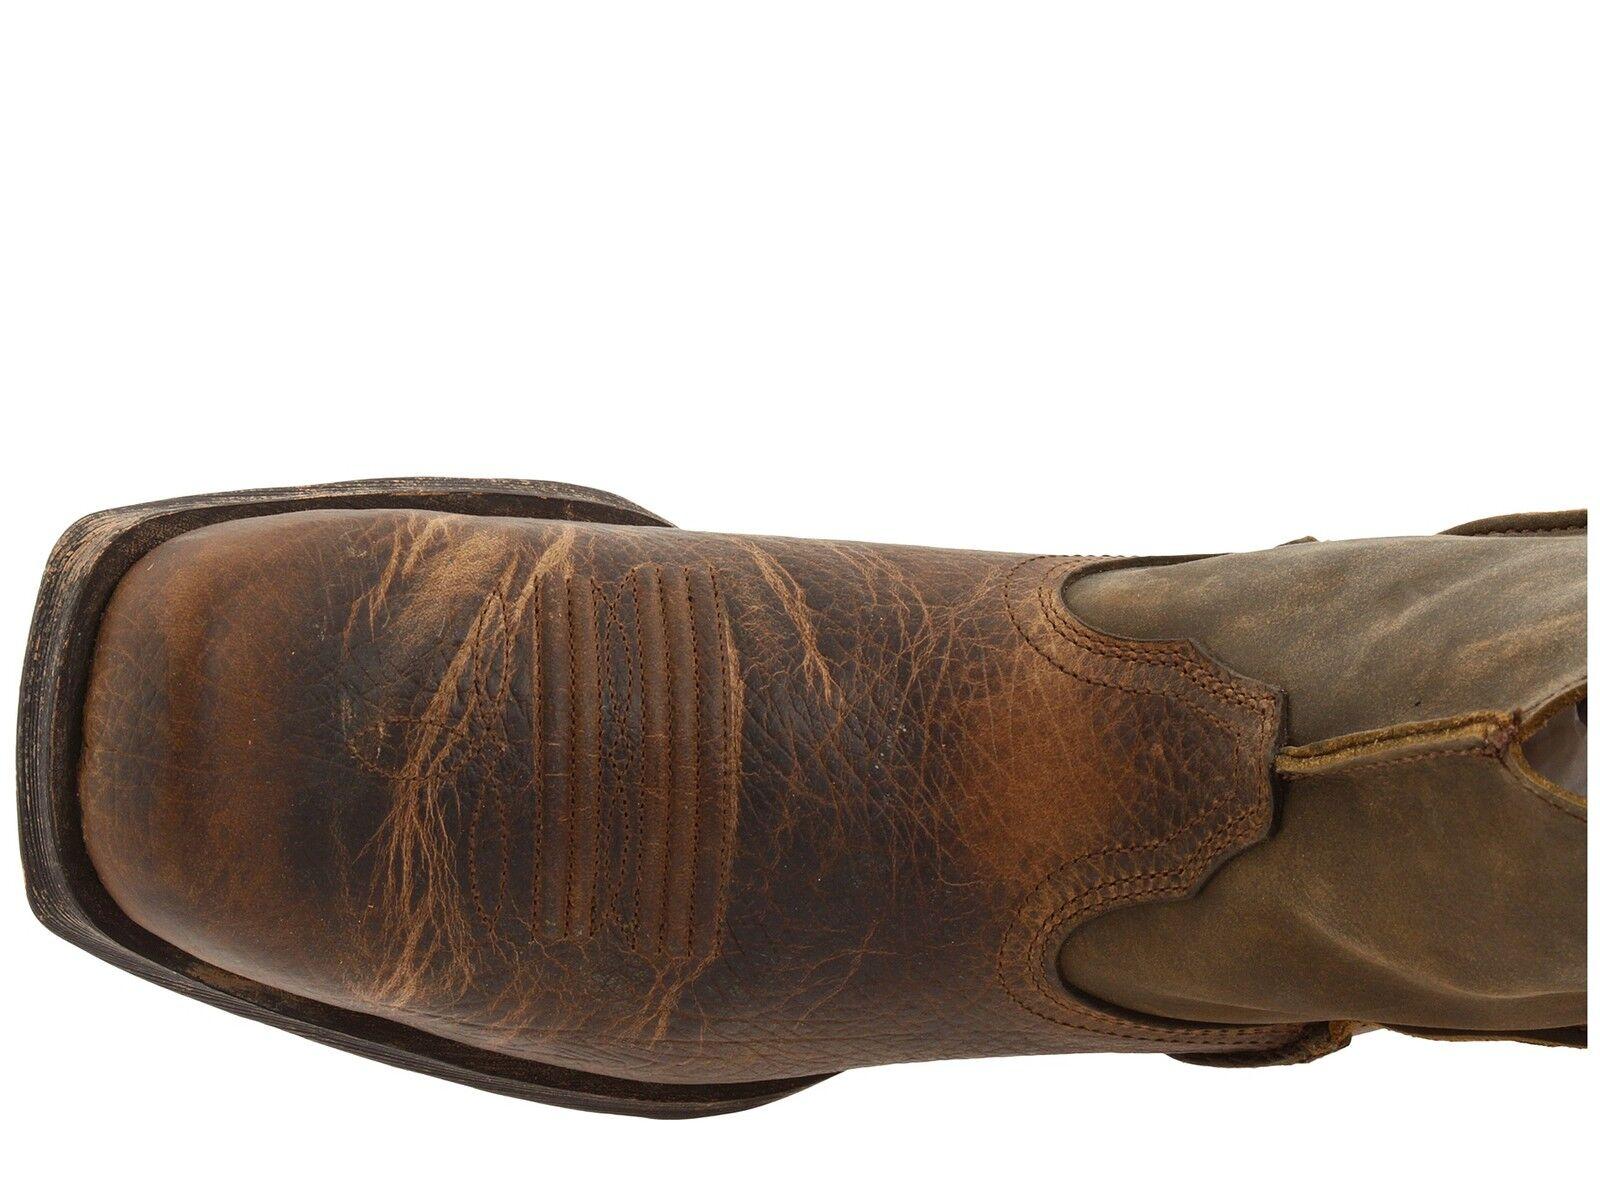 Ariat Men's Rambler Boot - Earth   Brown Bomber - 9.5